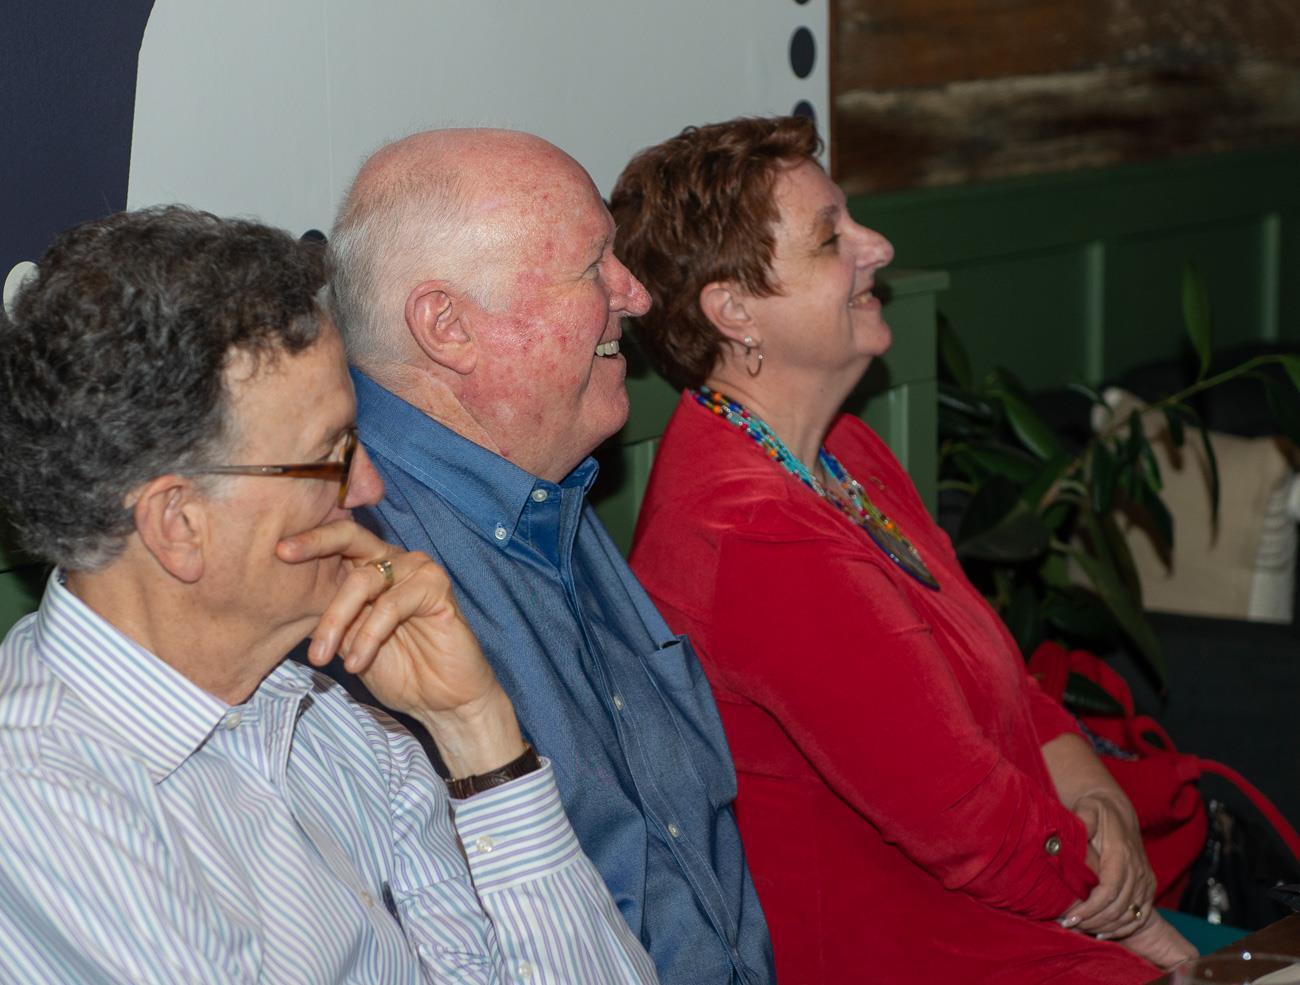 Tom Eakin, Steve Amend and Shauna Lorenzen